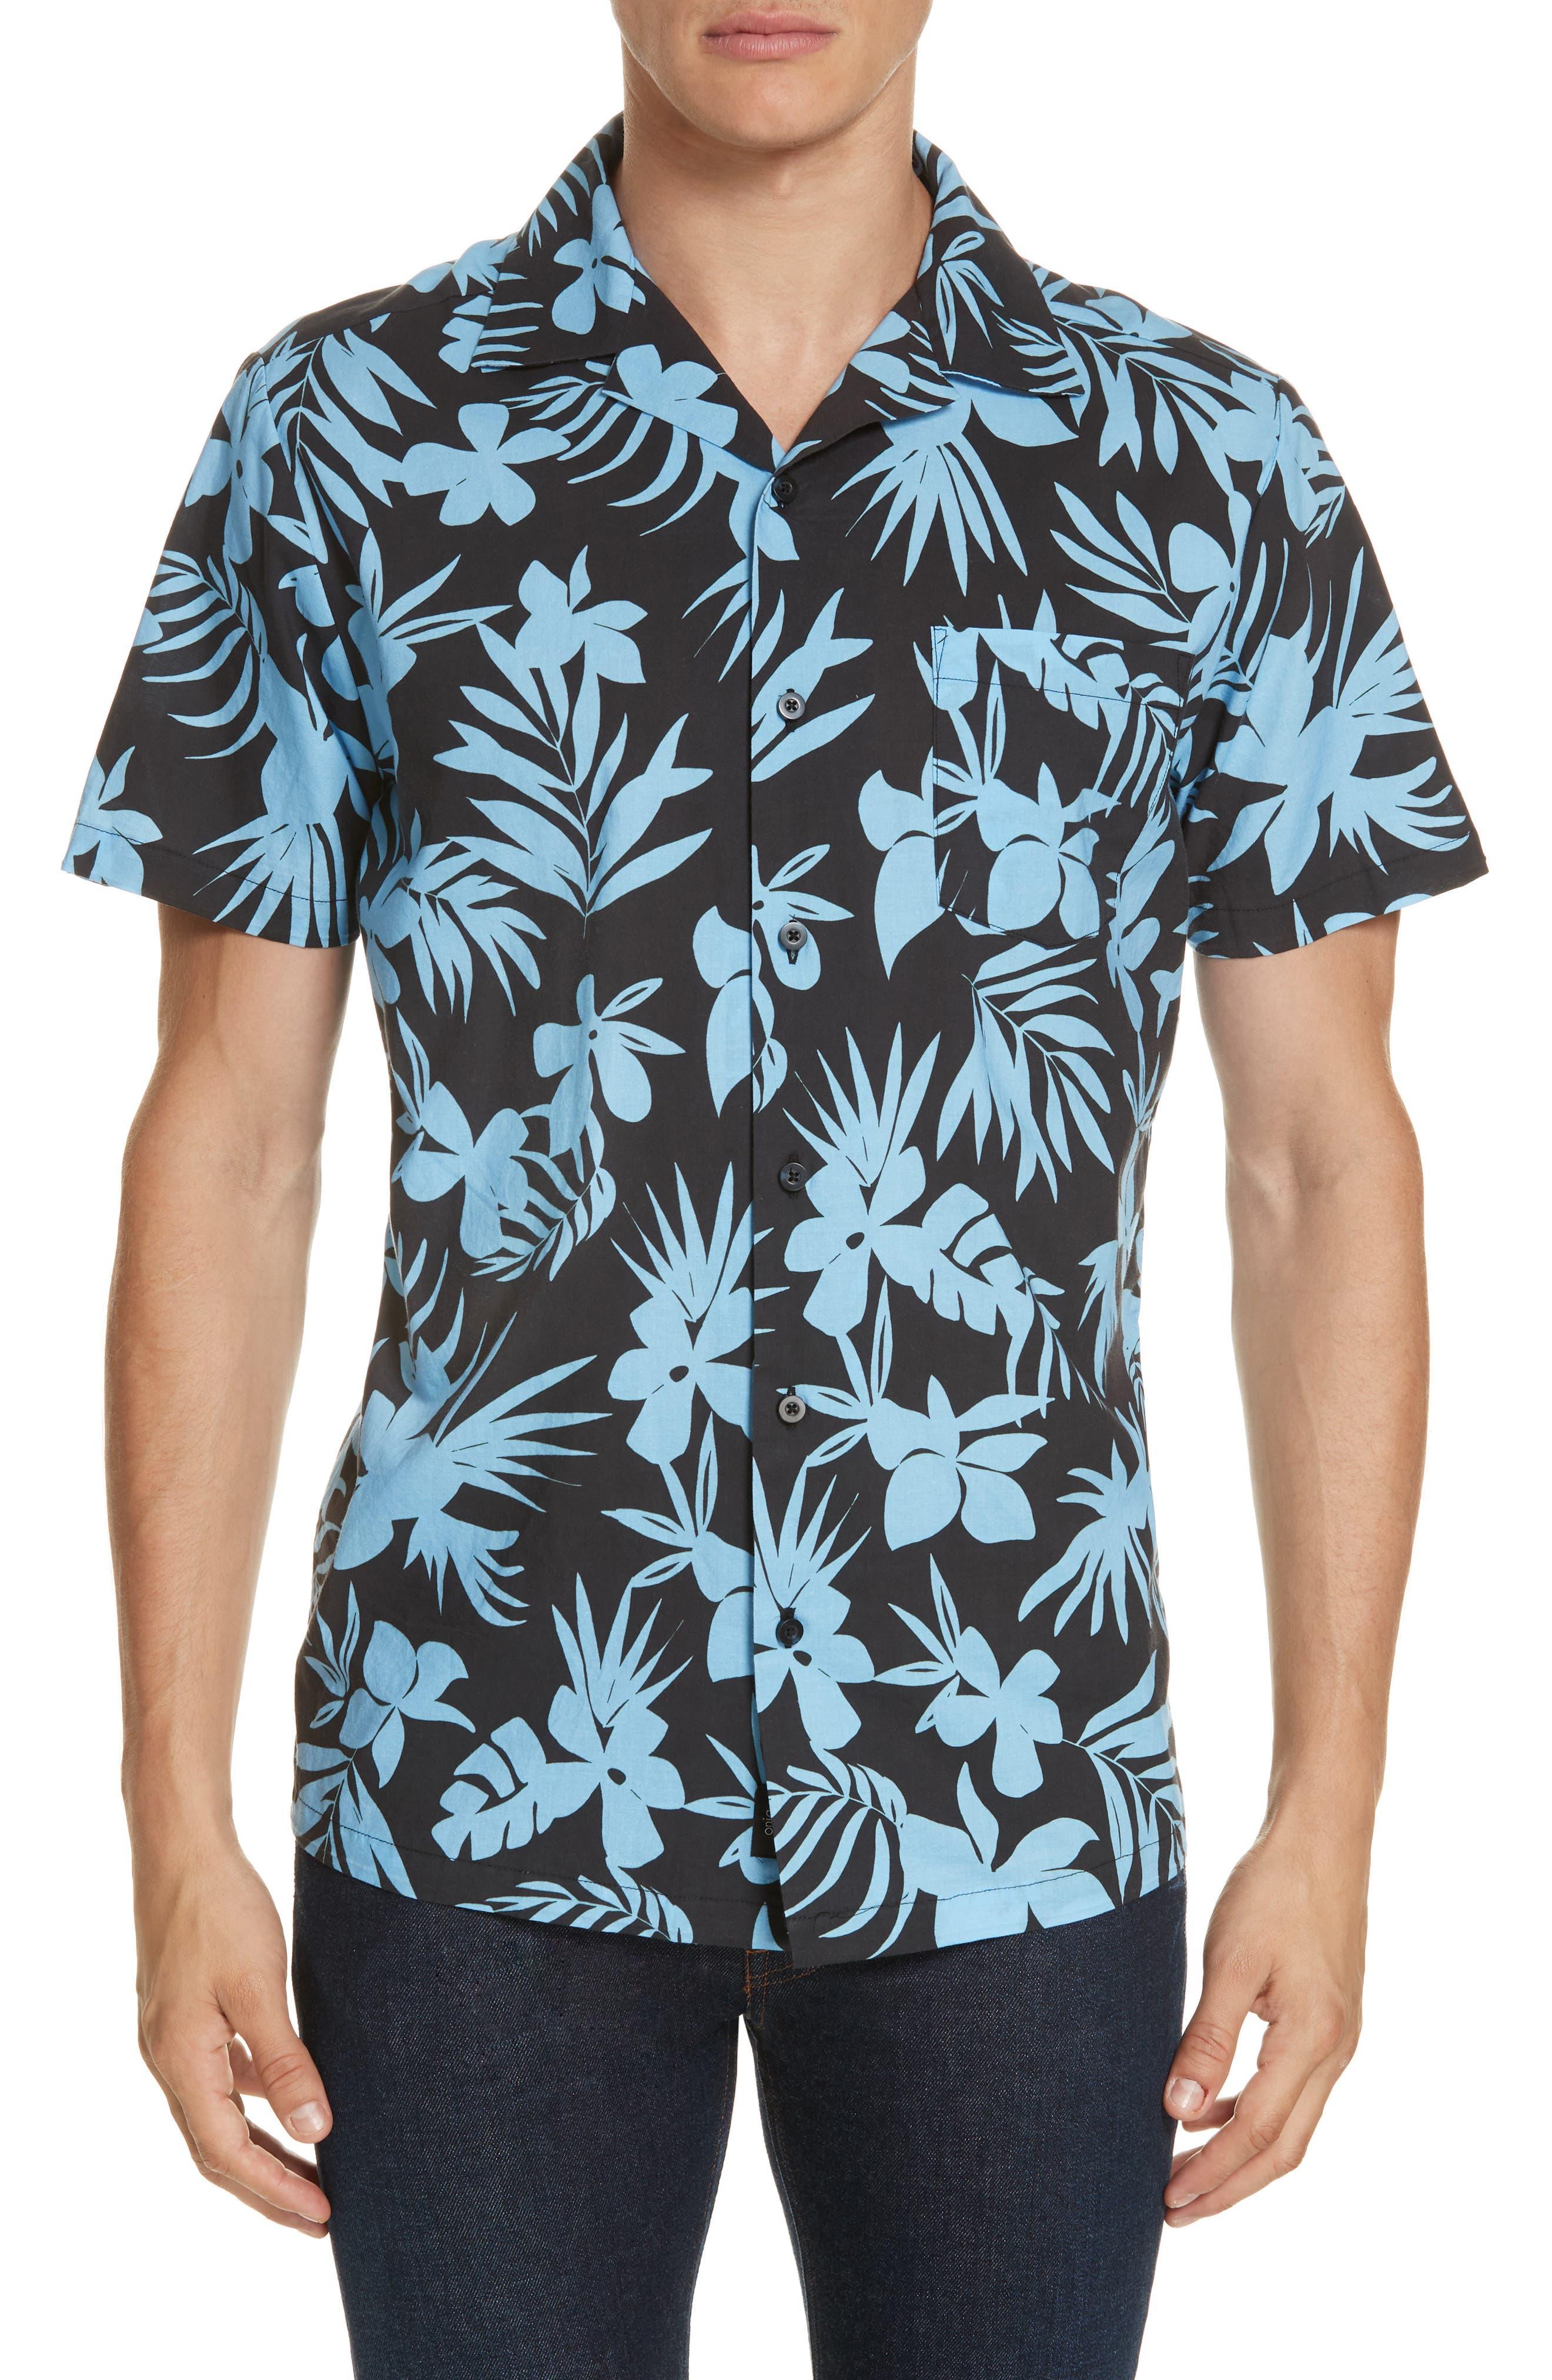 Image of Onia Vacation Hawaiian Shirt